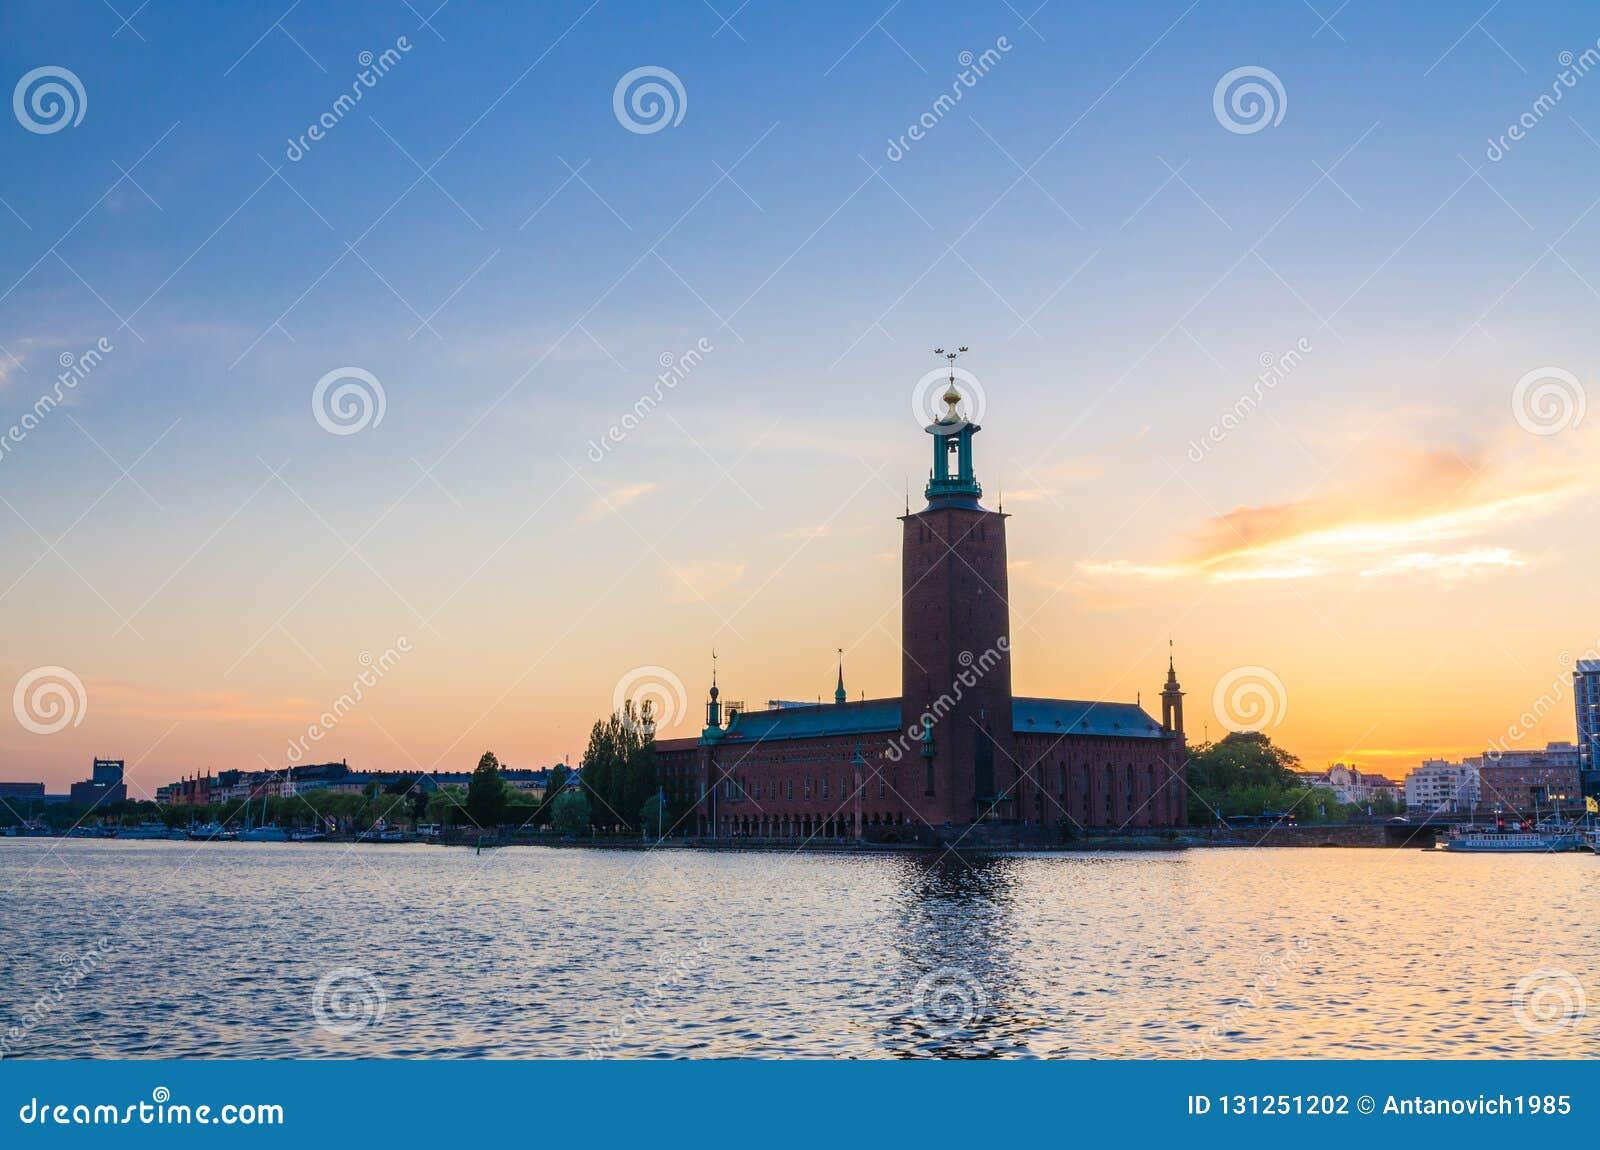 Stockholm-Stadt-Hall Stadshuset-Turm bei Sonnenuntergang, Dämmerung, Schweden